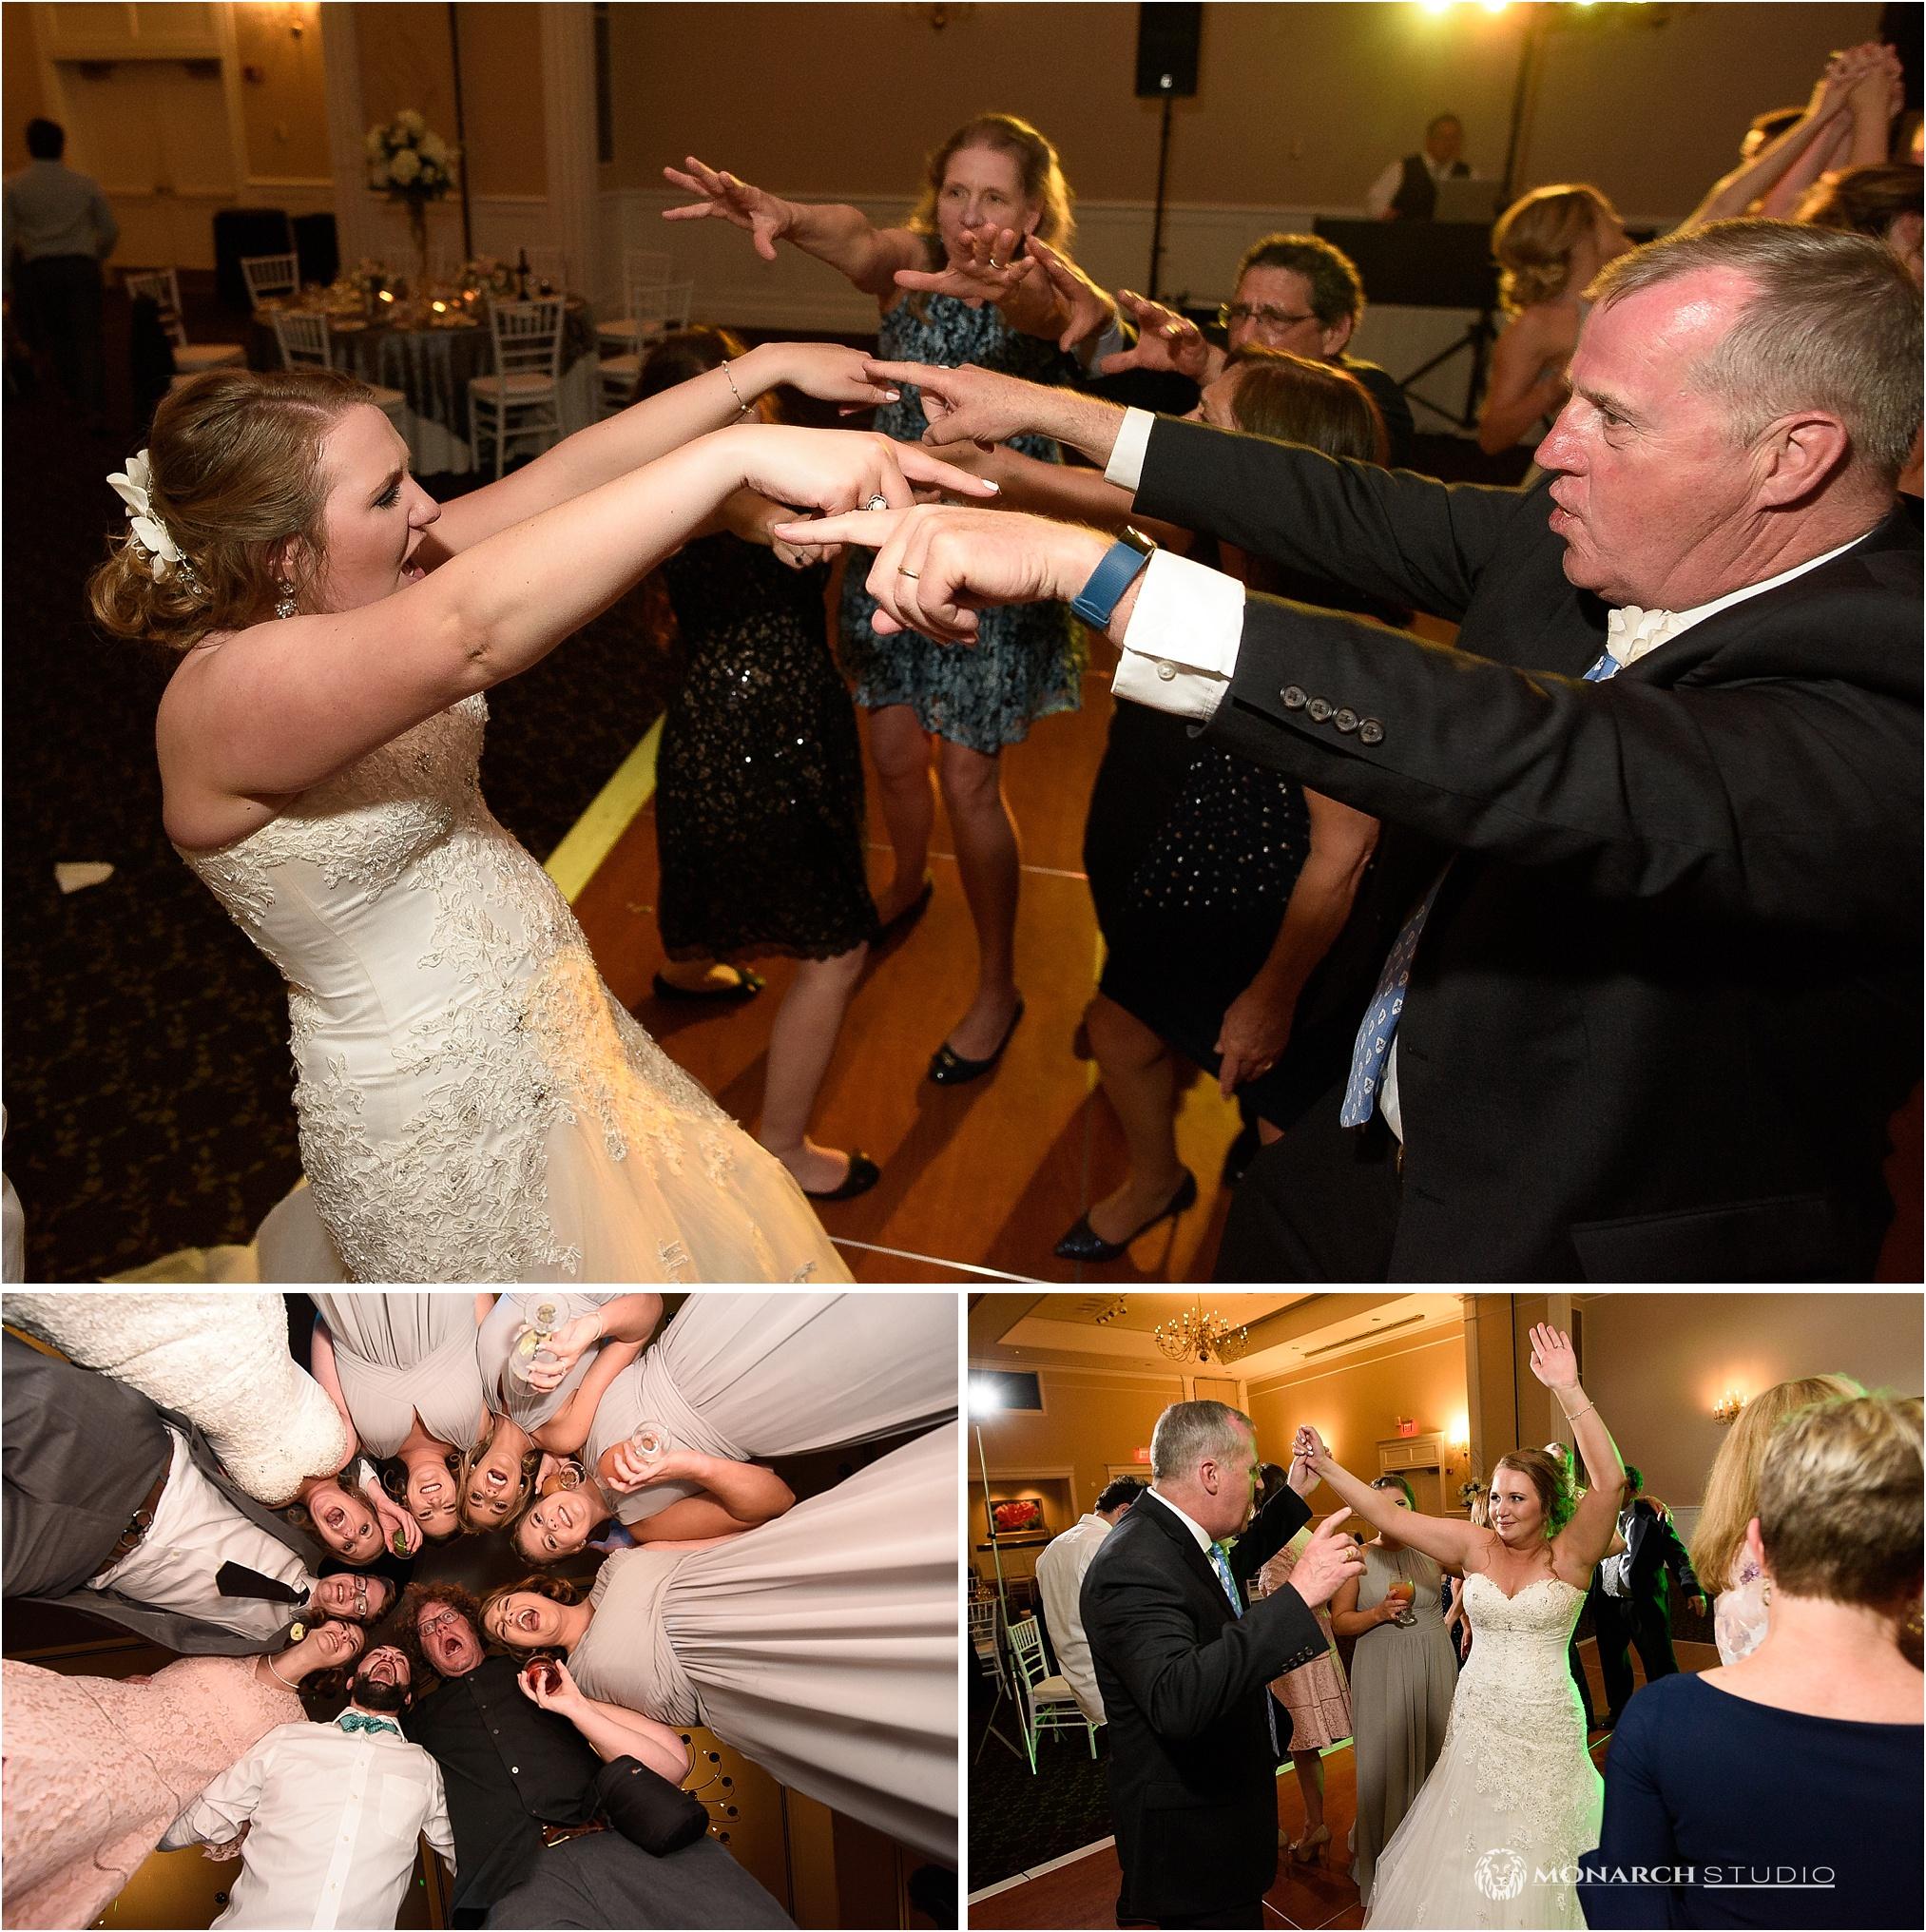 williamsburg-virginia-wedding-photographer-145.jpg